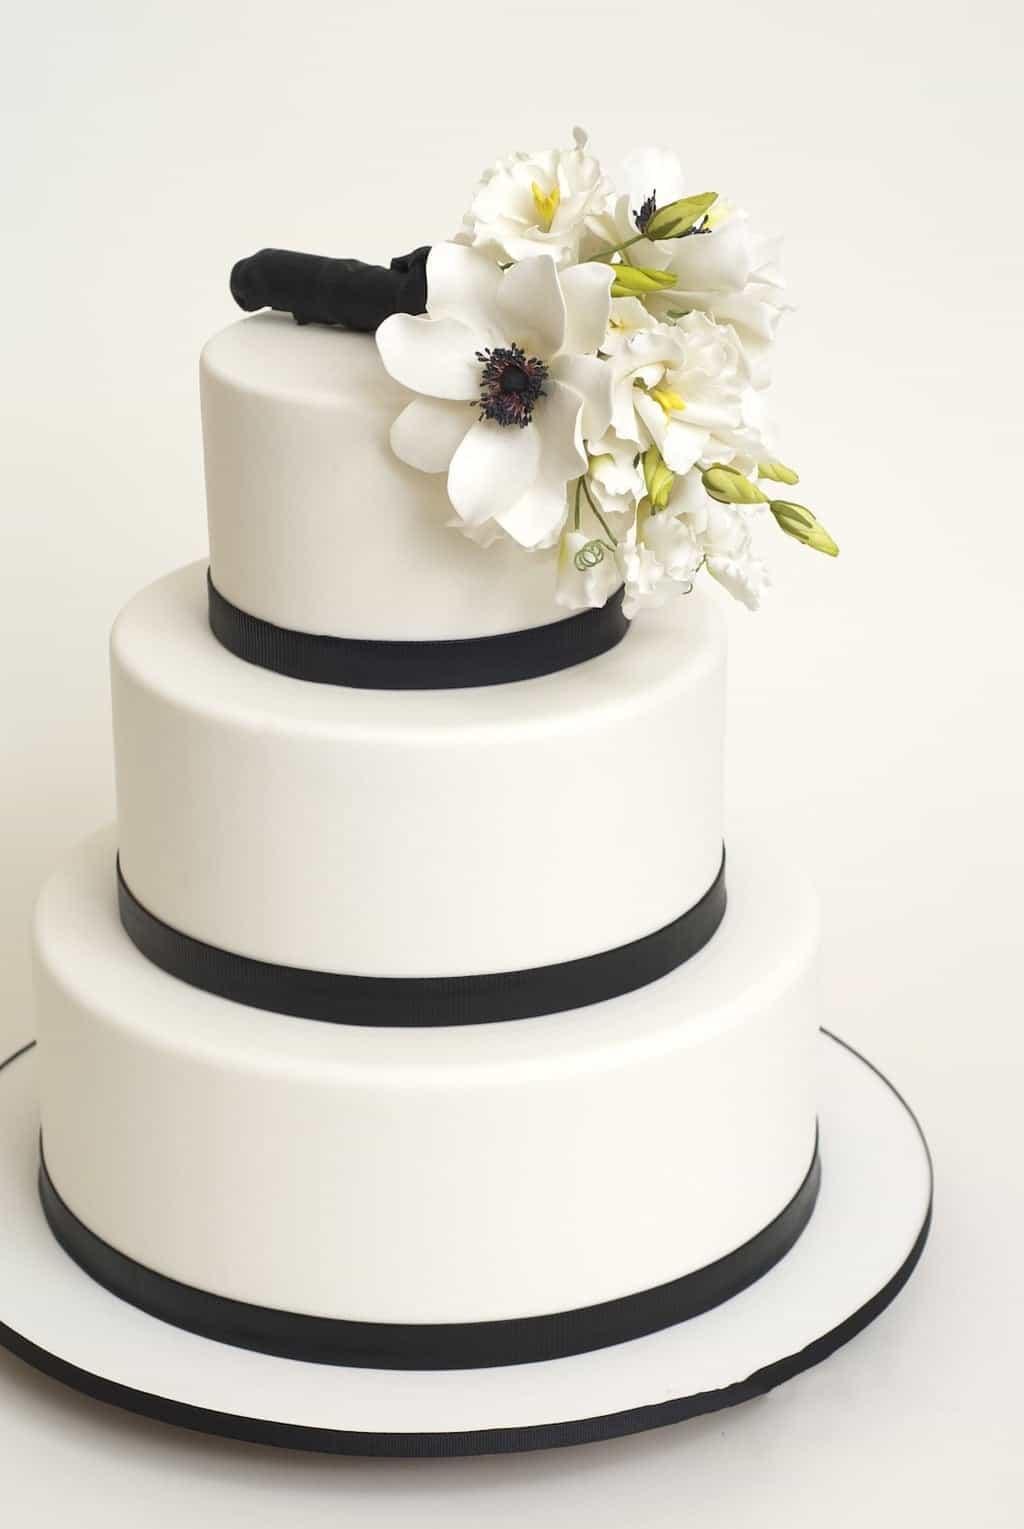 16 Elegant Classic Wedding Cakes #19510 | Wedding Ideas